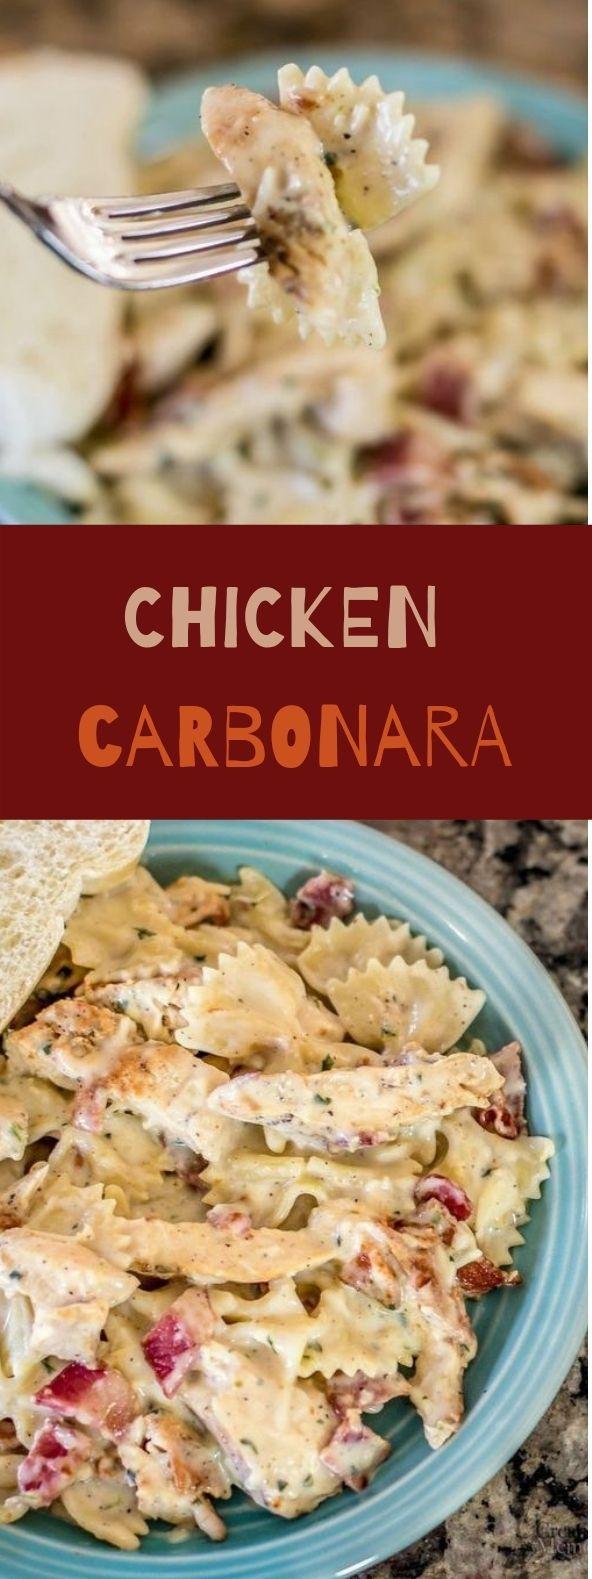 Sensational Chicken Carbonara Bestmeal Pasta Gourmet Chicken Chicken Carbonara Recipe Recipes